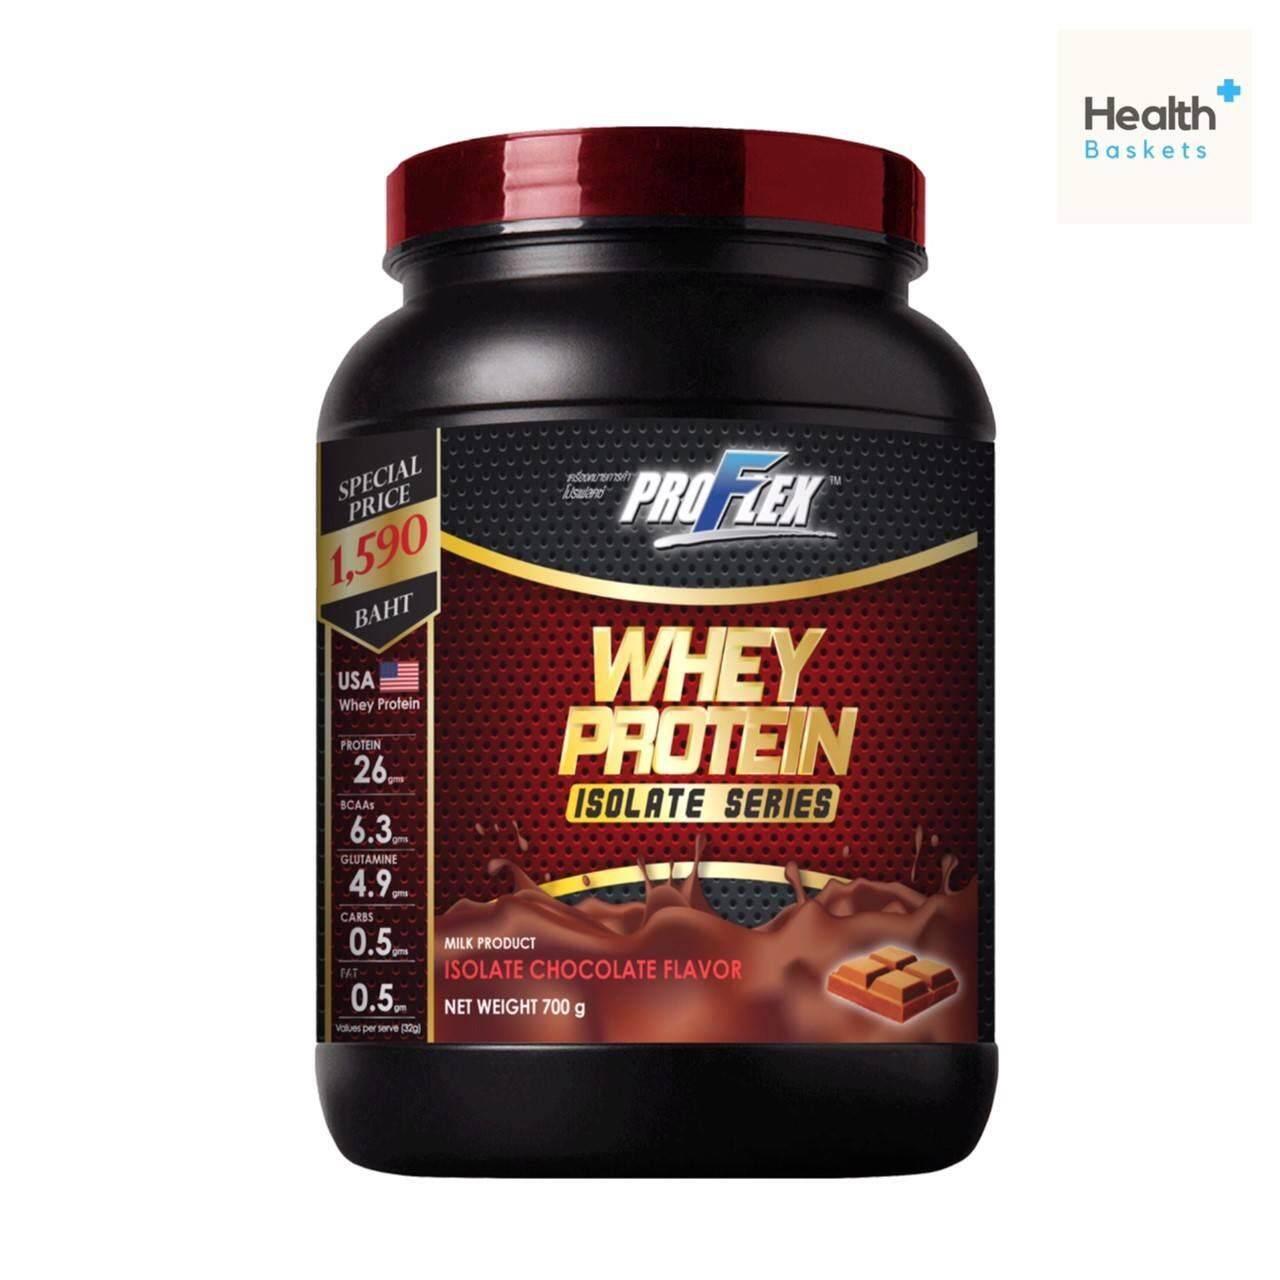 Proflex Whey Protein Isolate CHOCOLATE 1 กระป๋อง โปรเฟล็กซ์ เวย์โปรตีน รสช็อกโกแลต สูตรไอโซเลท 700 g